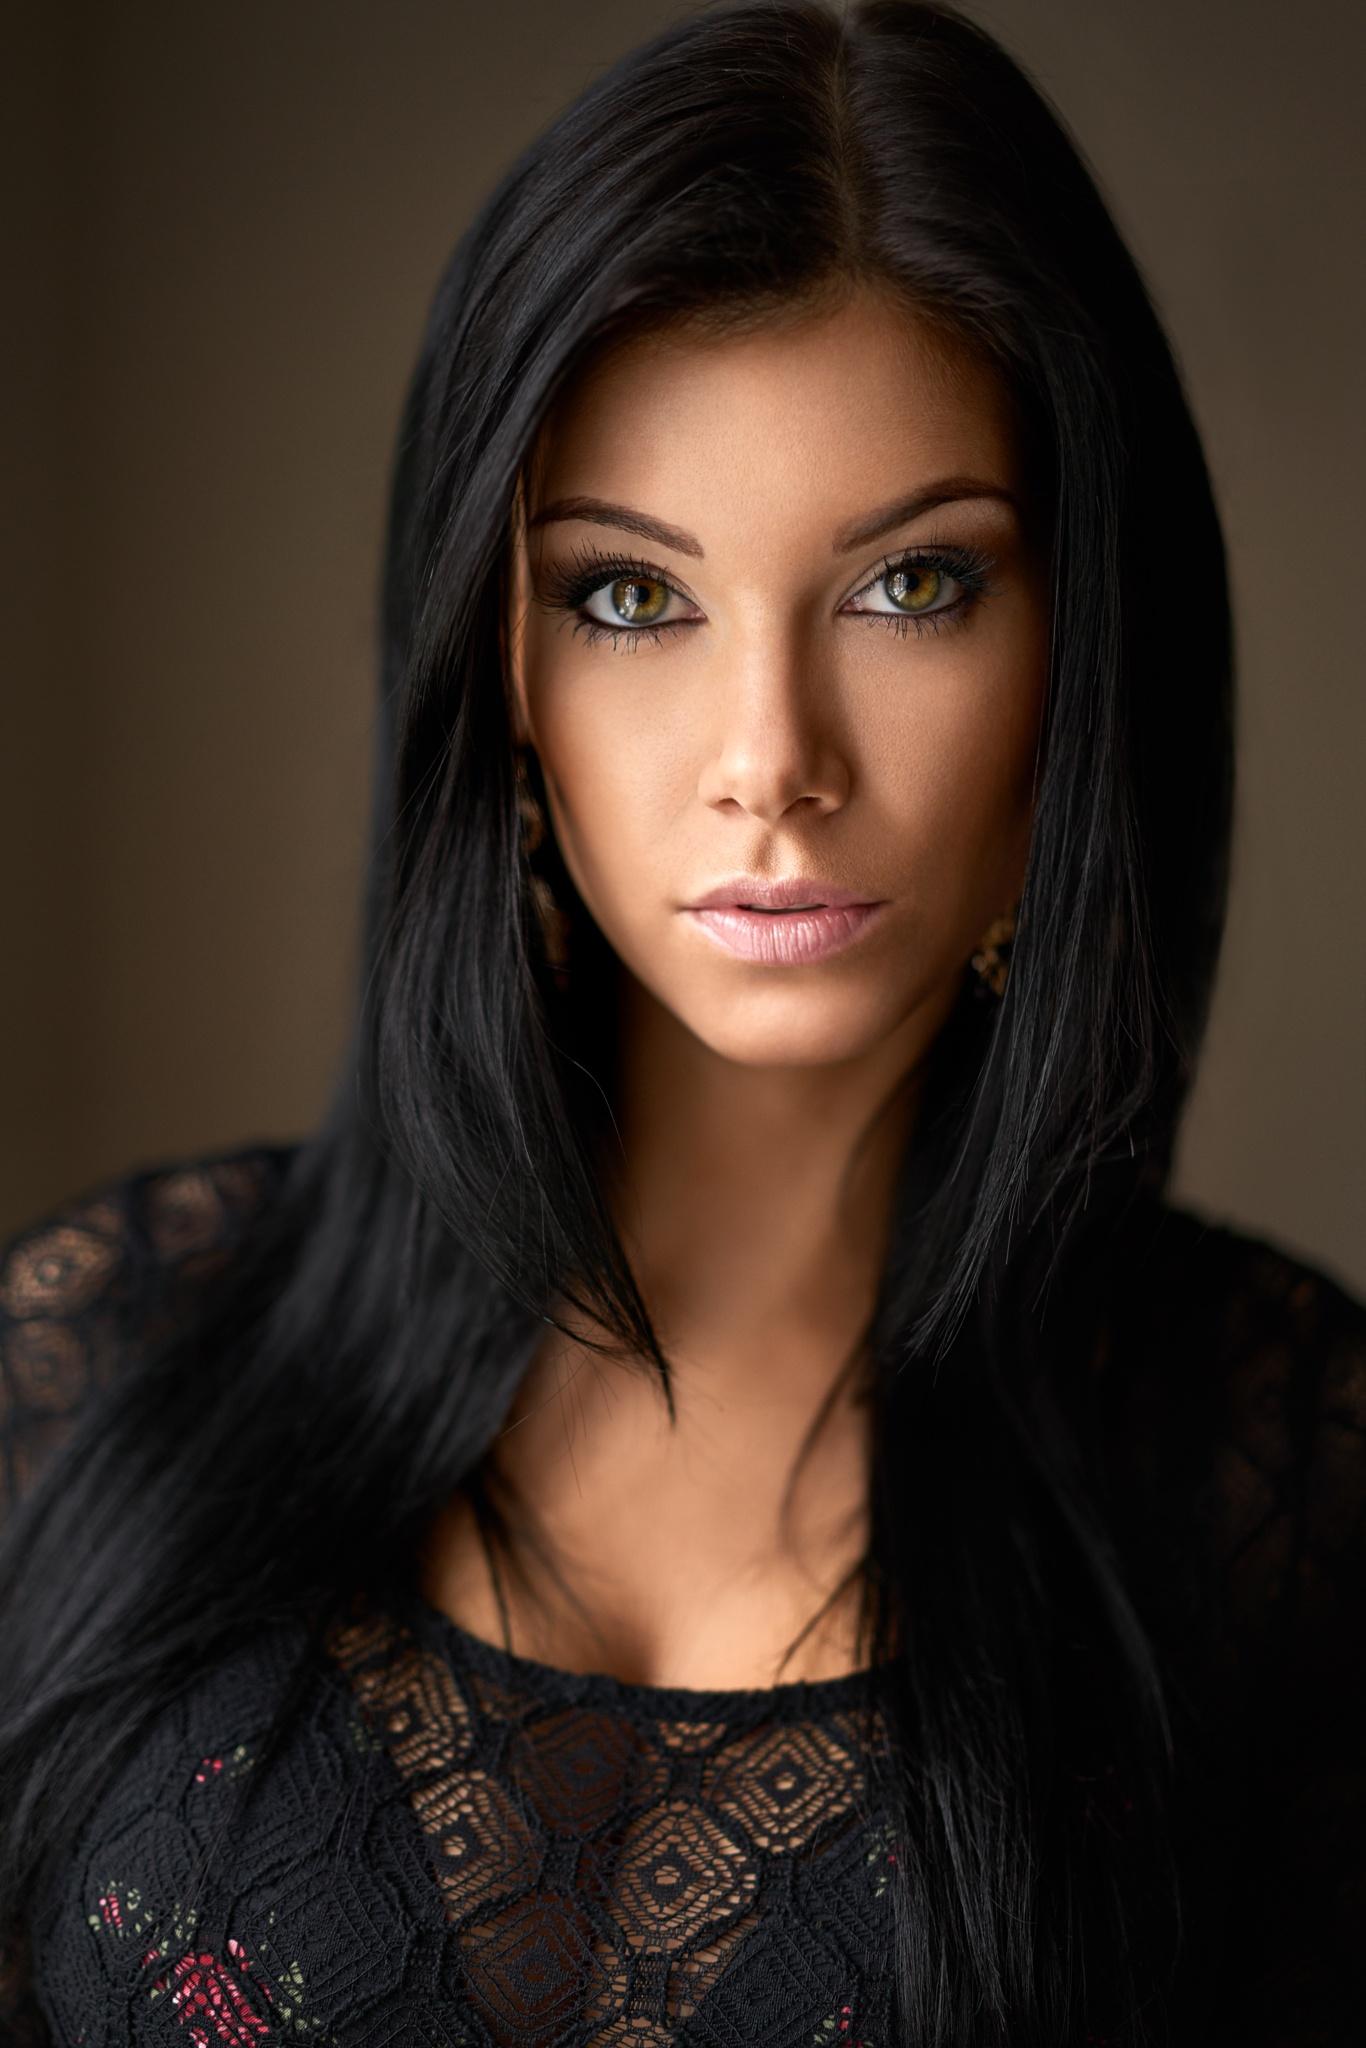 Green eyes of Terezka by mil4nek